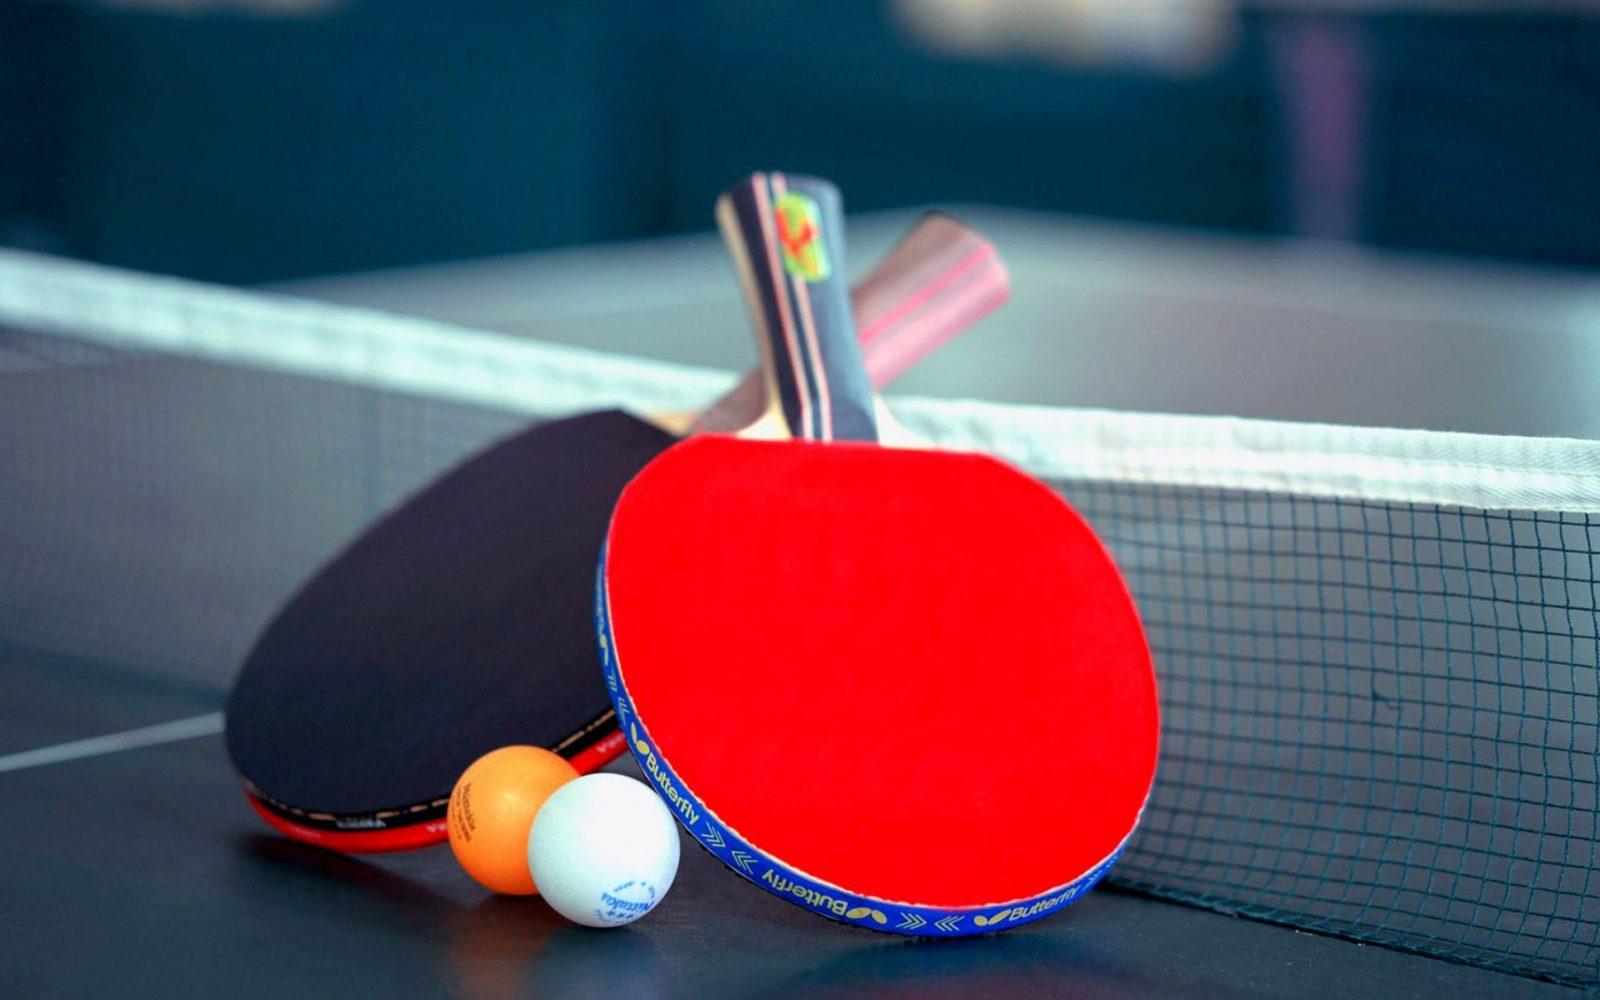 https://spektr35.ru/wp-content/uploads/2017/04/nastolnyy-tennis-kupit.jpg